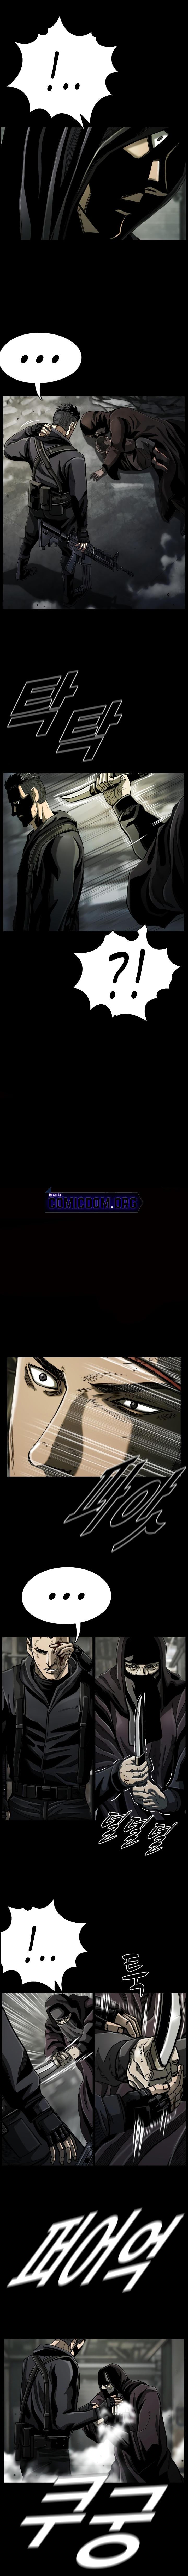 The First Hunter Chapter 73 page 13 - Mangakakalots.com